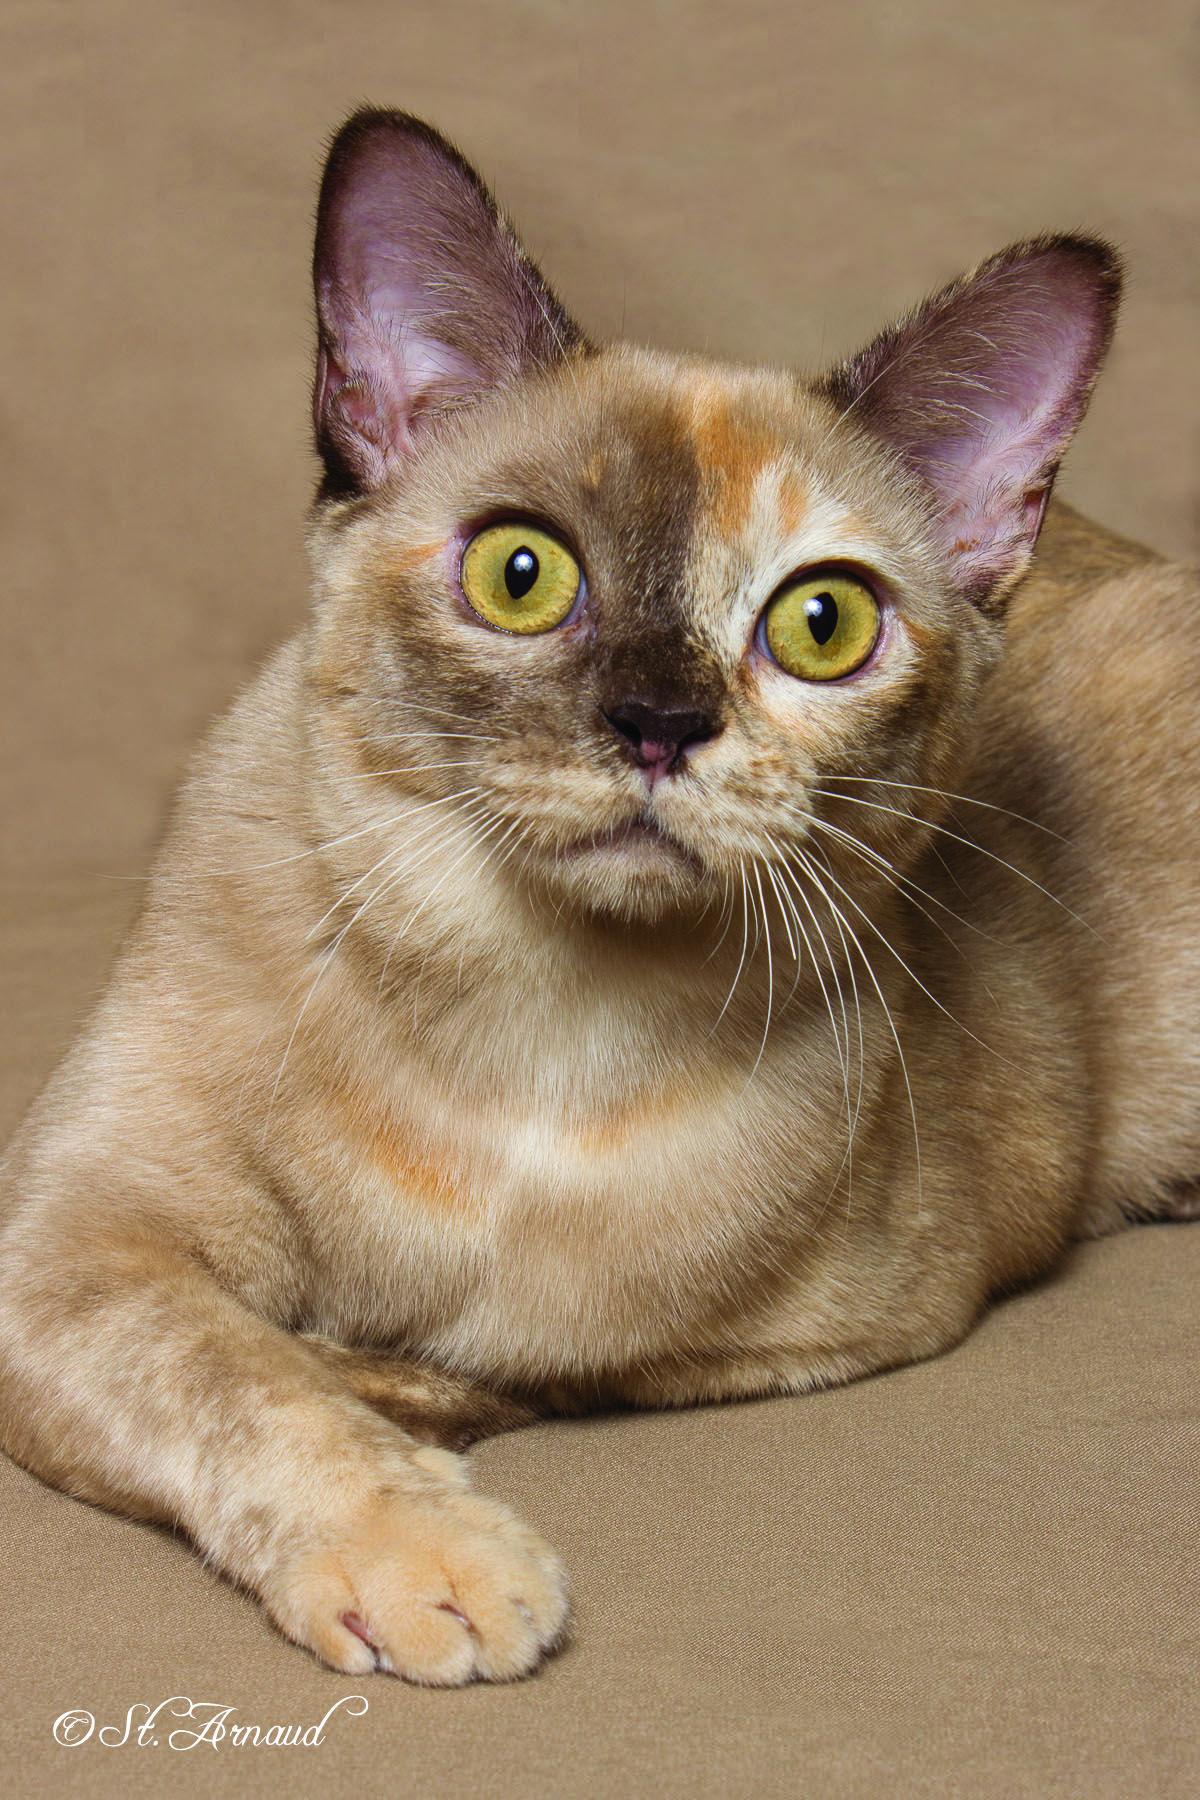 9th Best Cat Gc Rw Penobscot S Too Dam Hot Of Jomarkat Chocolate